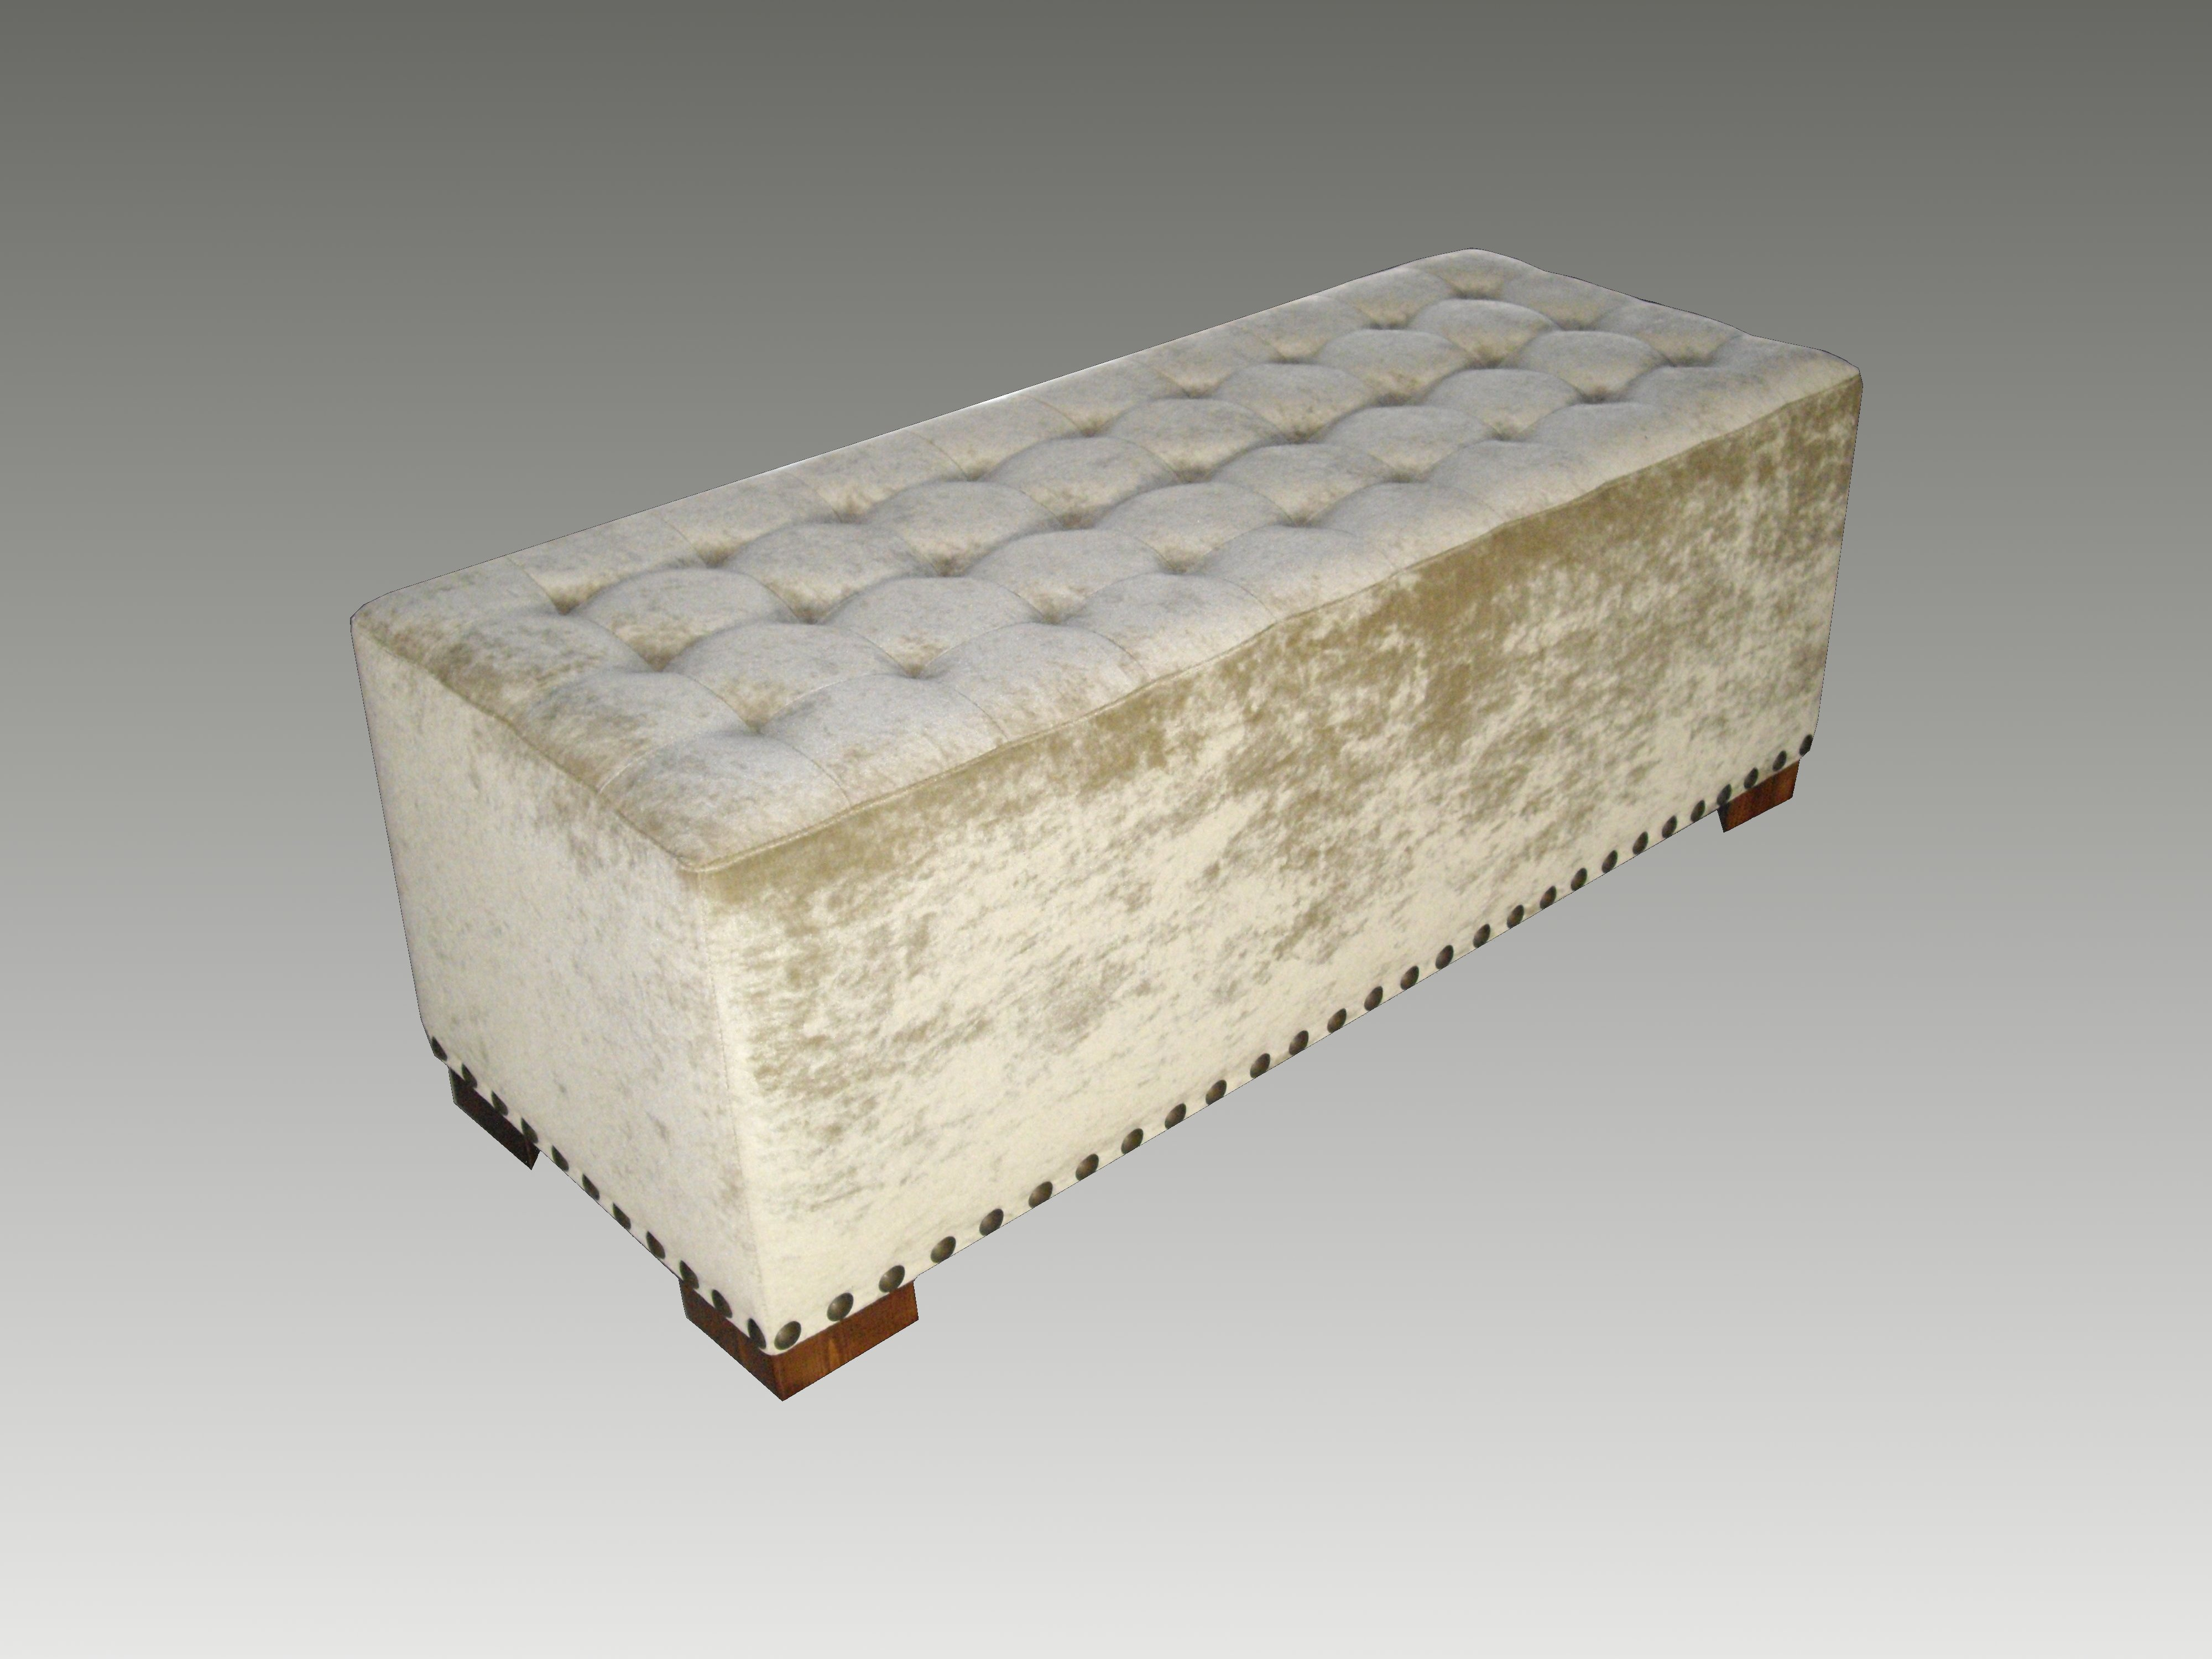 Pie de cama tapizados jubalcoy - Pie de cama ...